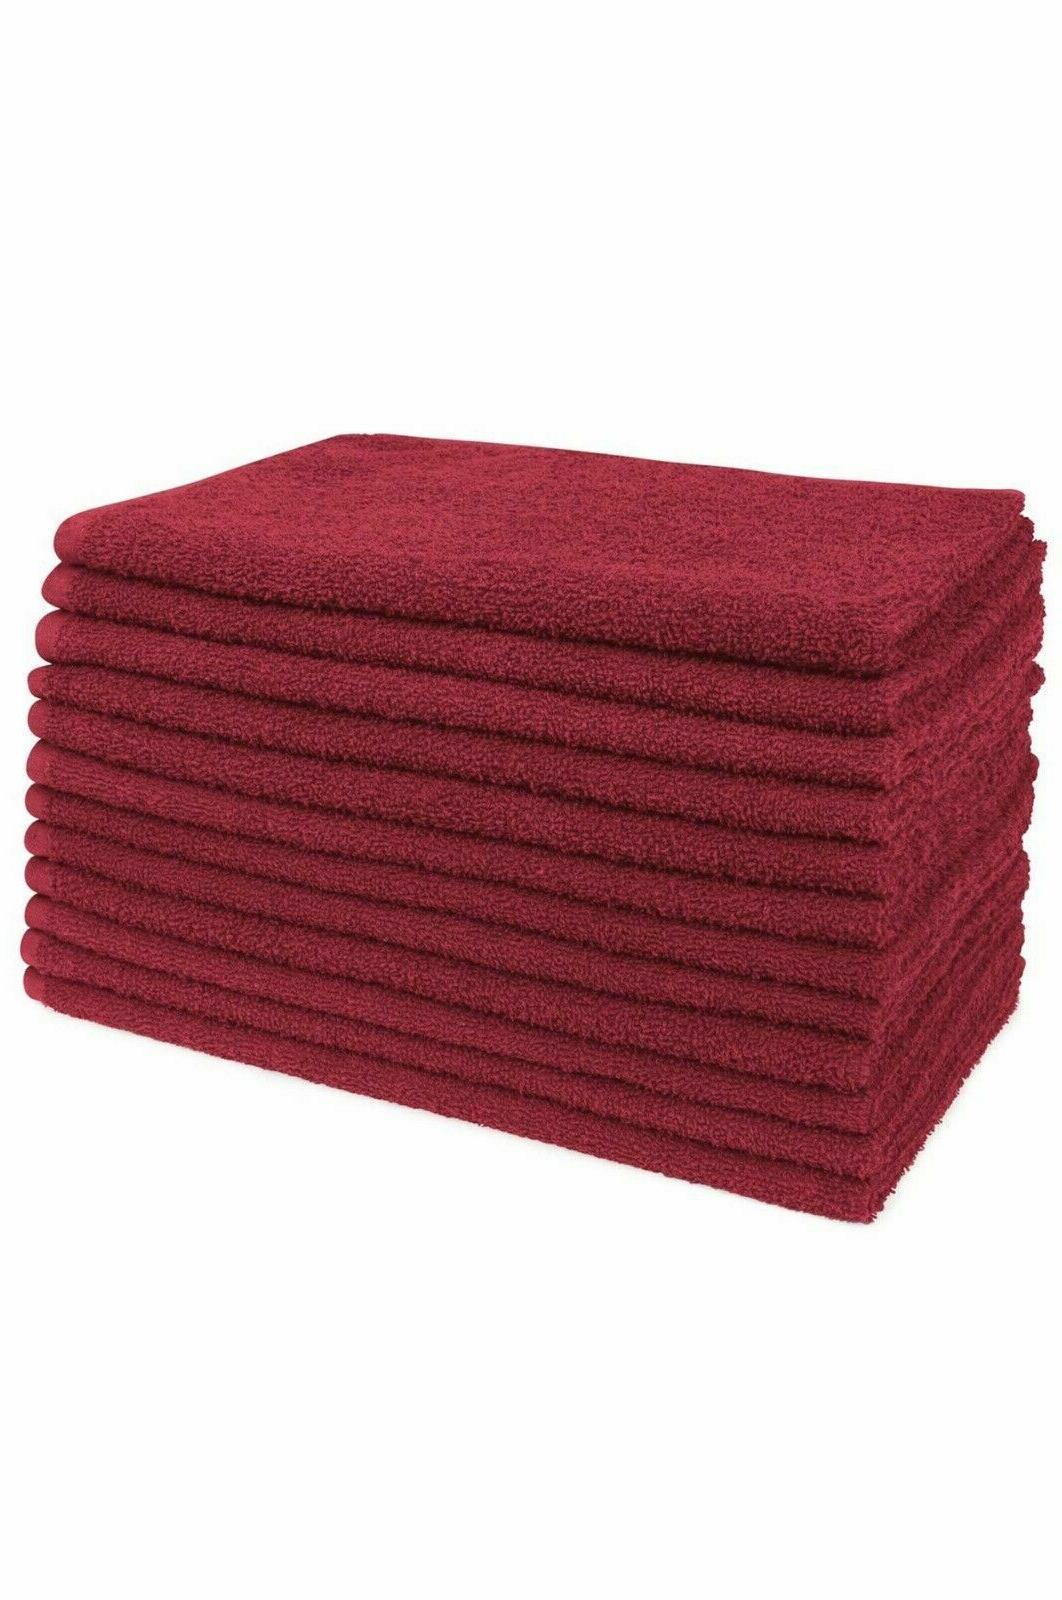 Salon Gym 100% 27 inch Hand Towel